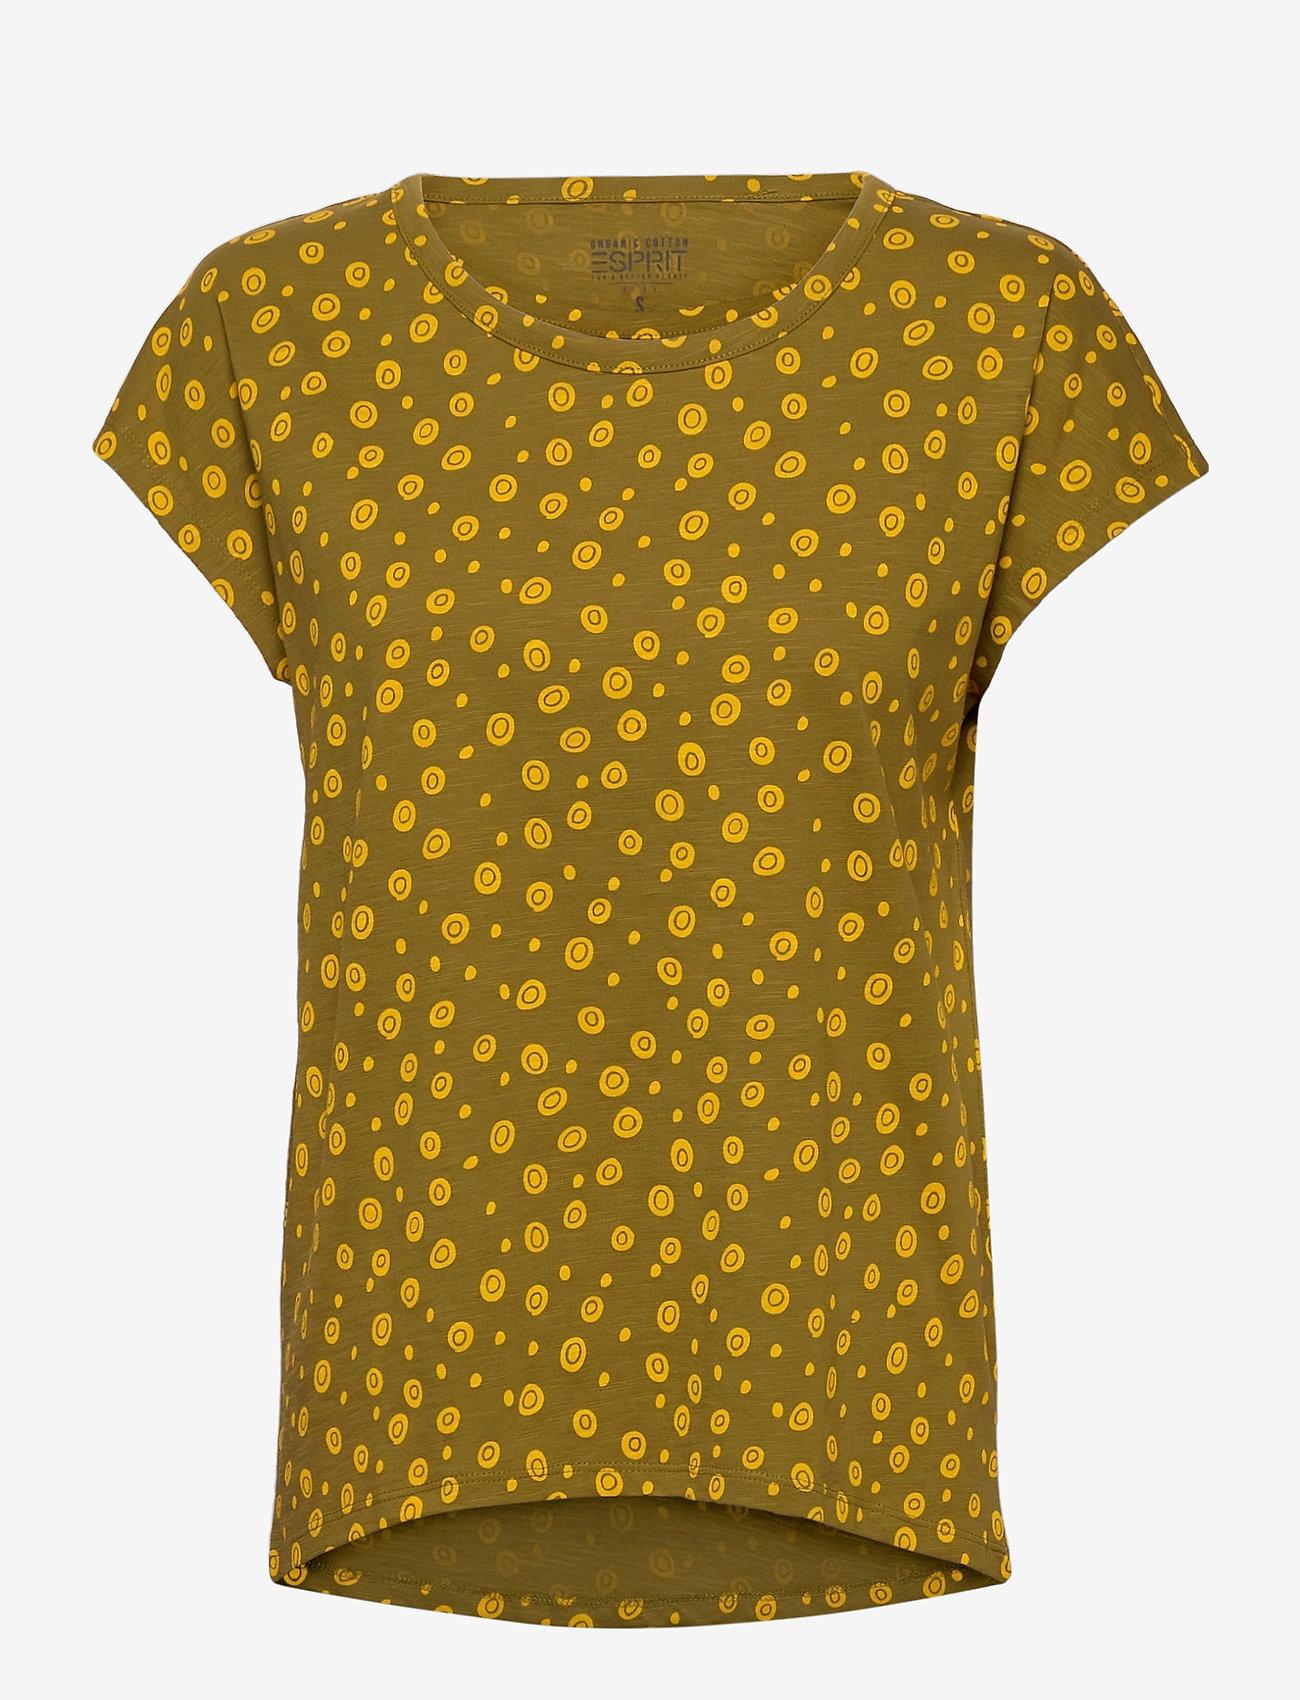 Esprit Casual - T-Shirts - t-shirts - olive - 0